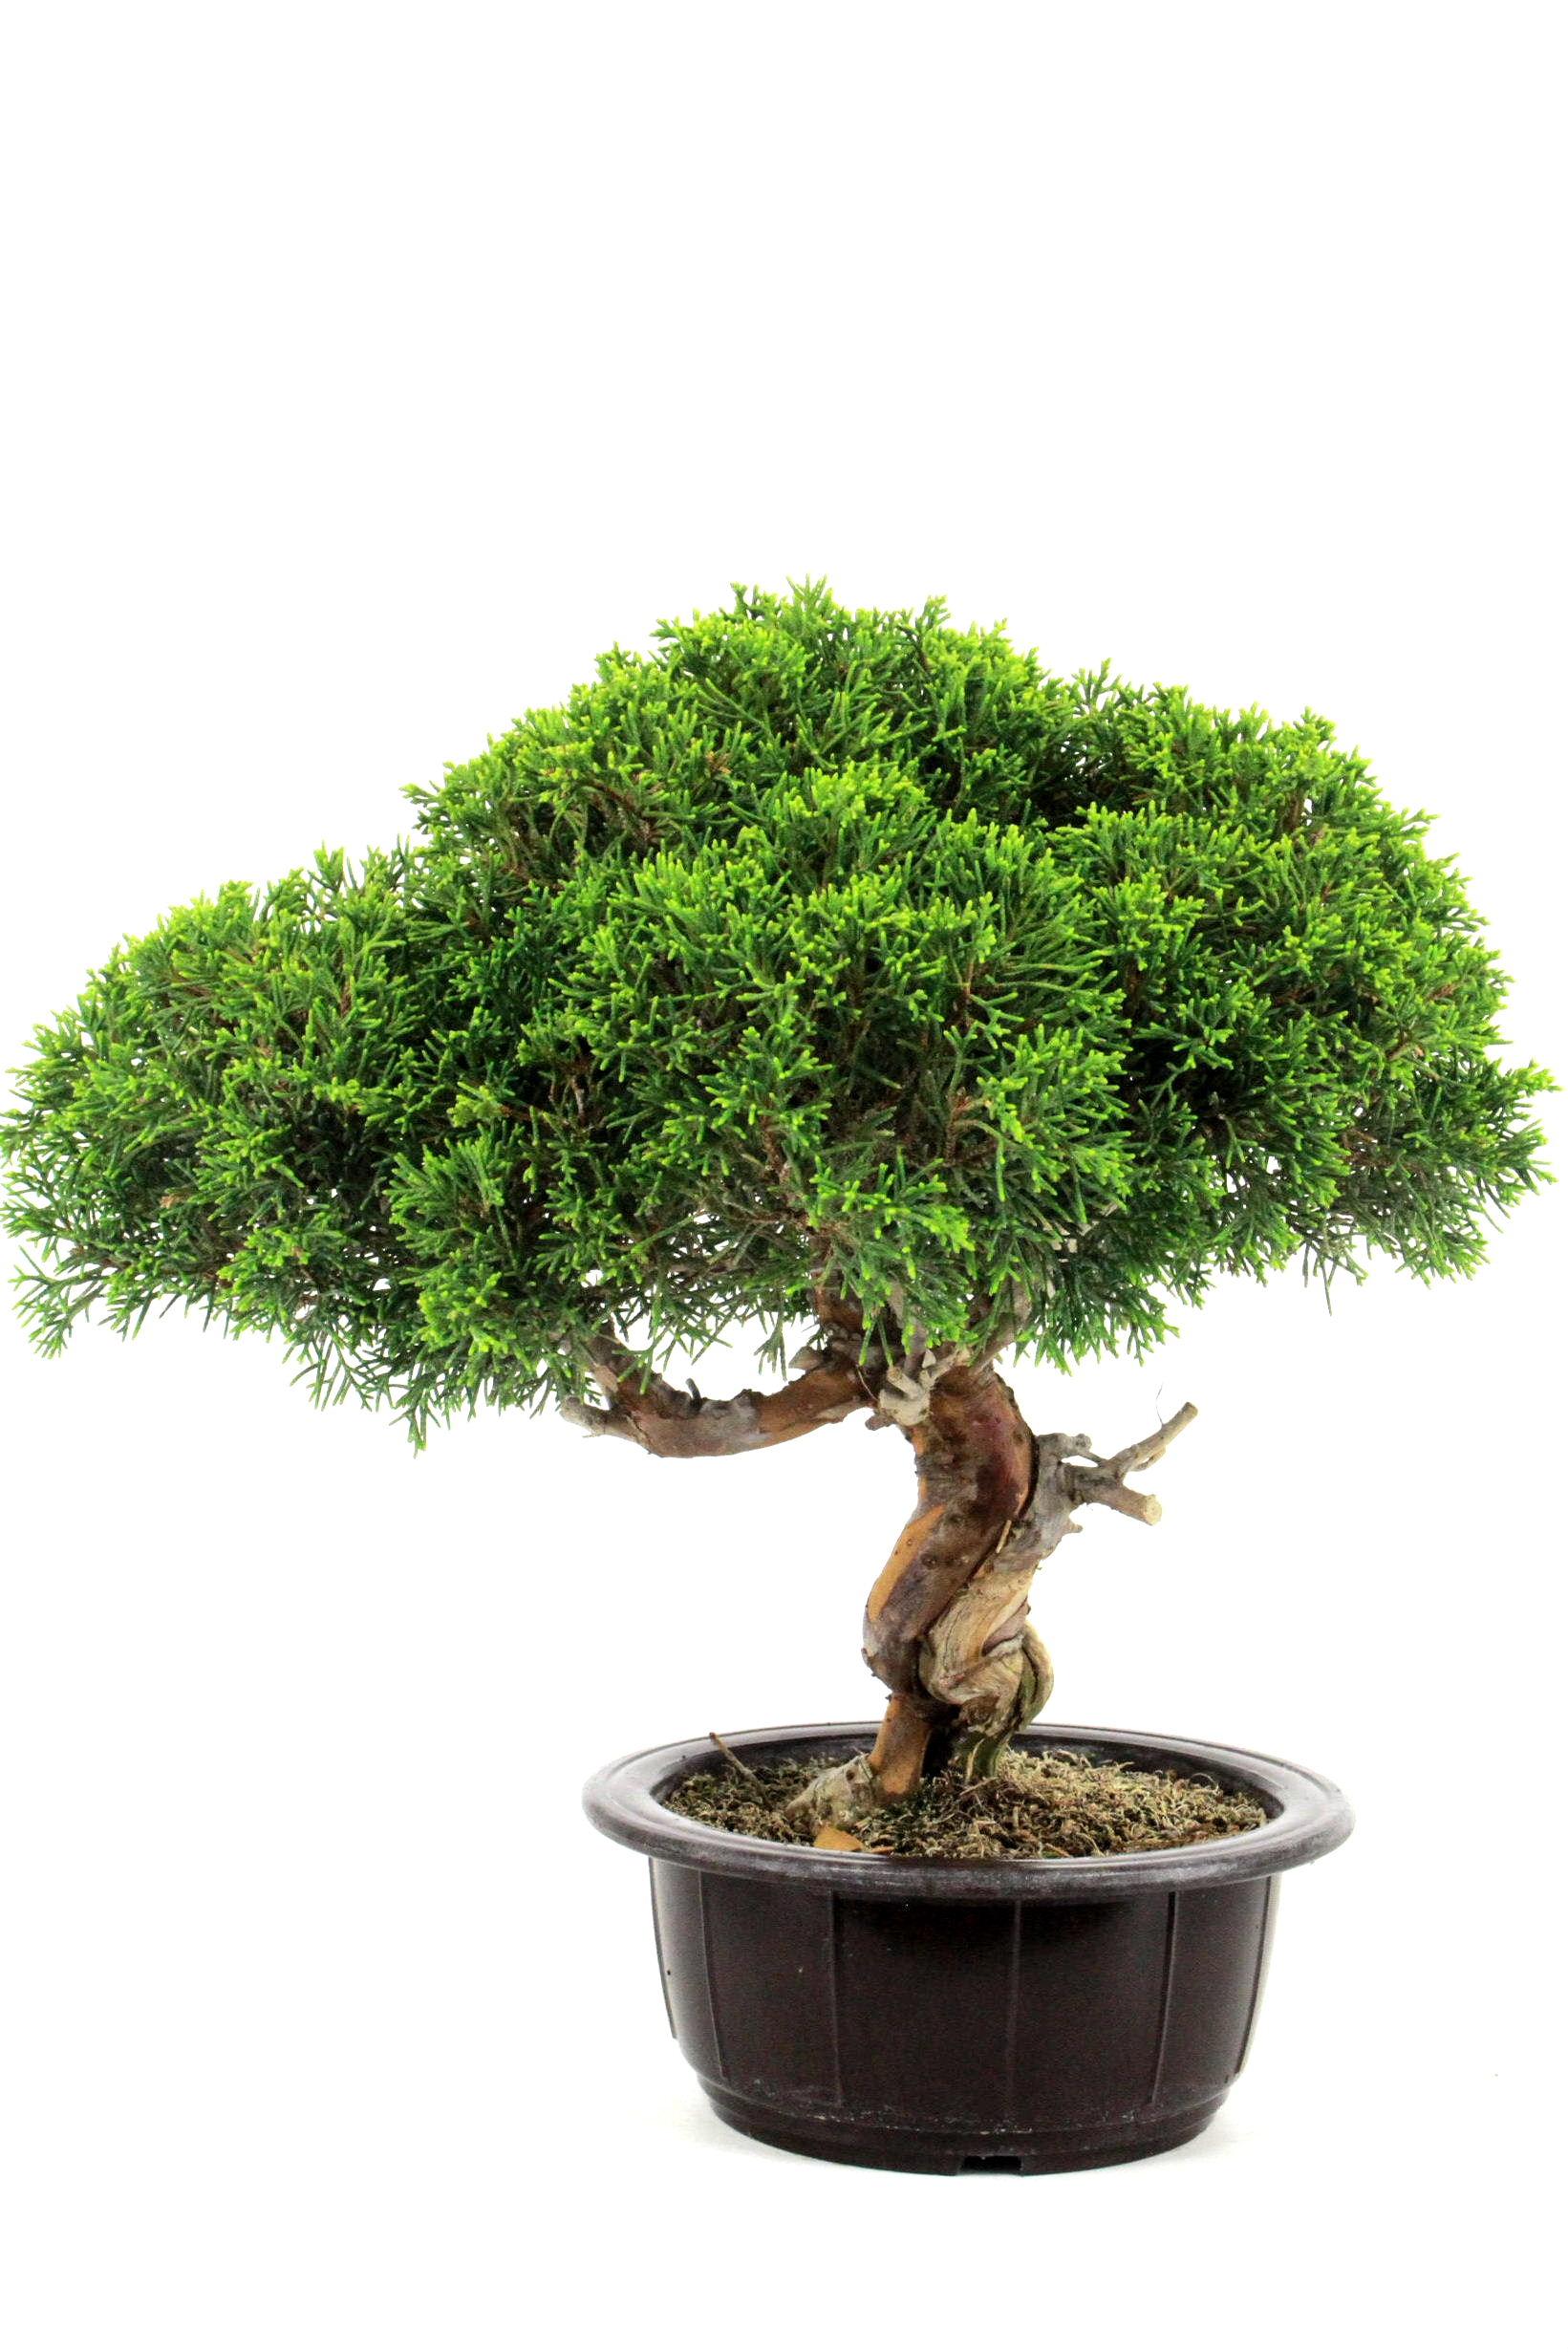 bonsai wacholder juniperus chinensis aus japan 47 cm bei oyaki bonsai kaufen. Black Bedroom Furniture Sets. Home Design Ideas